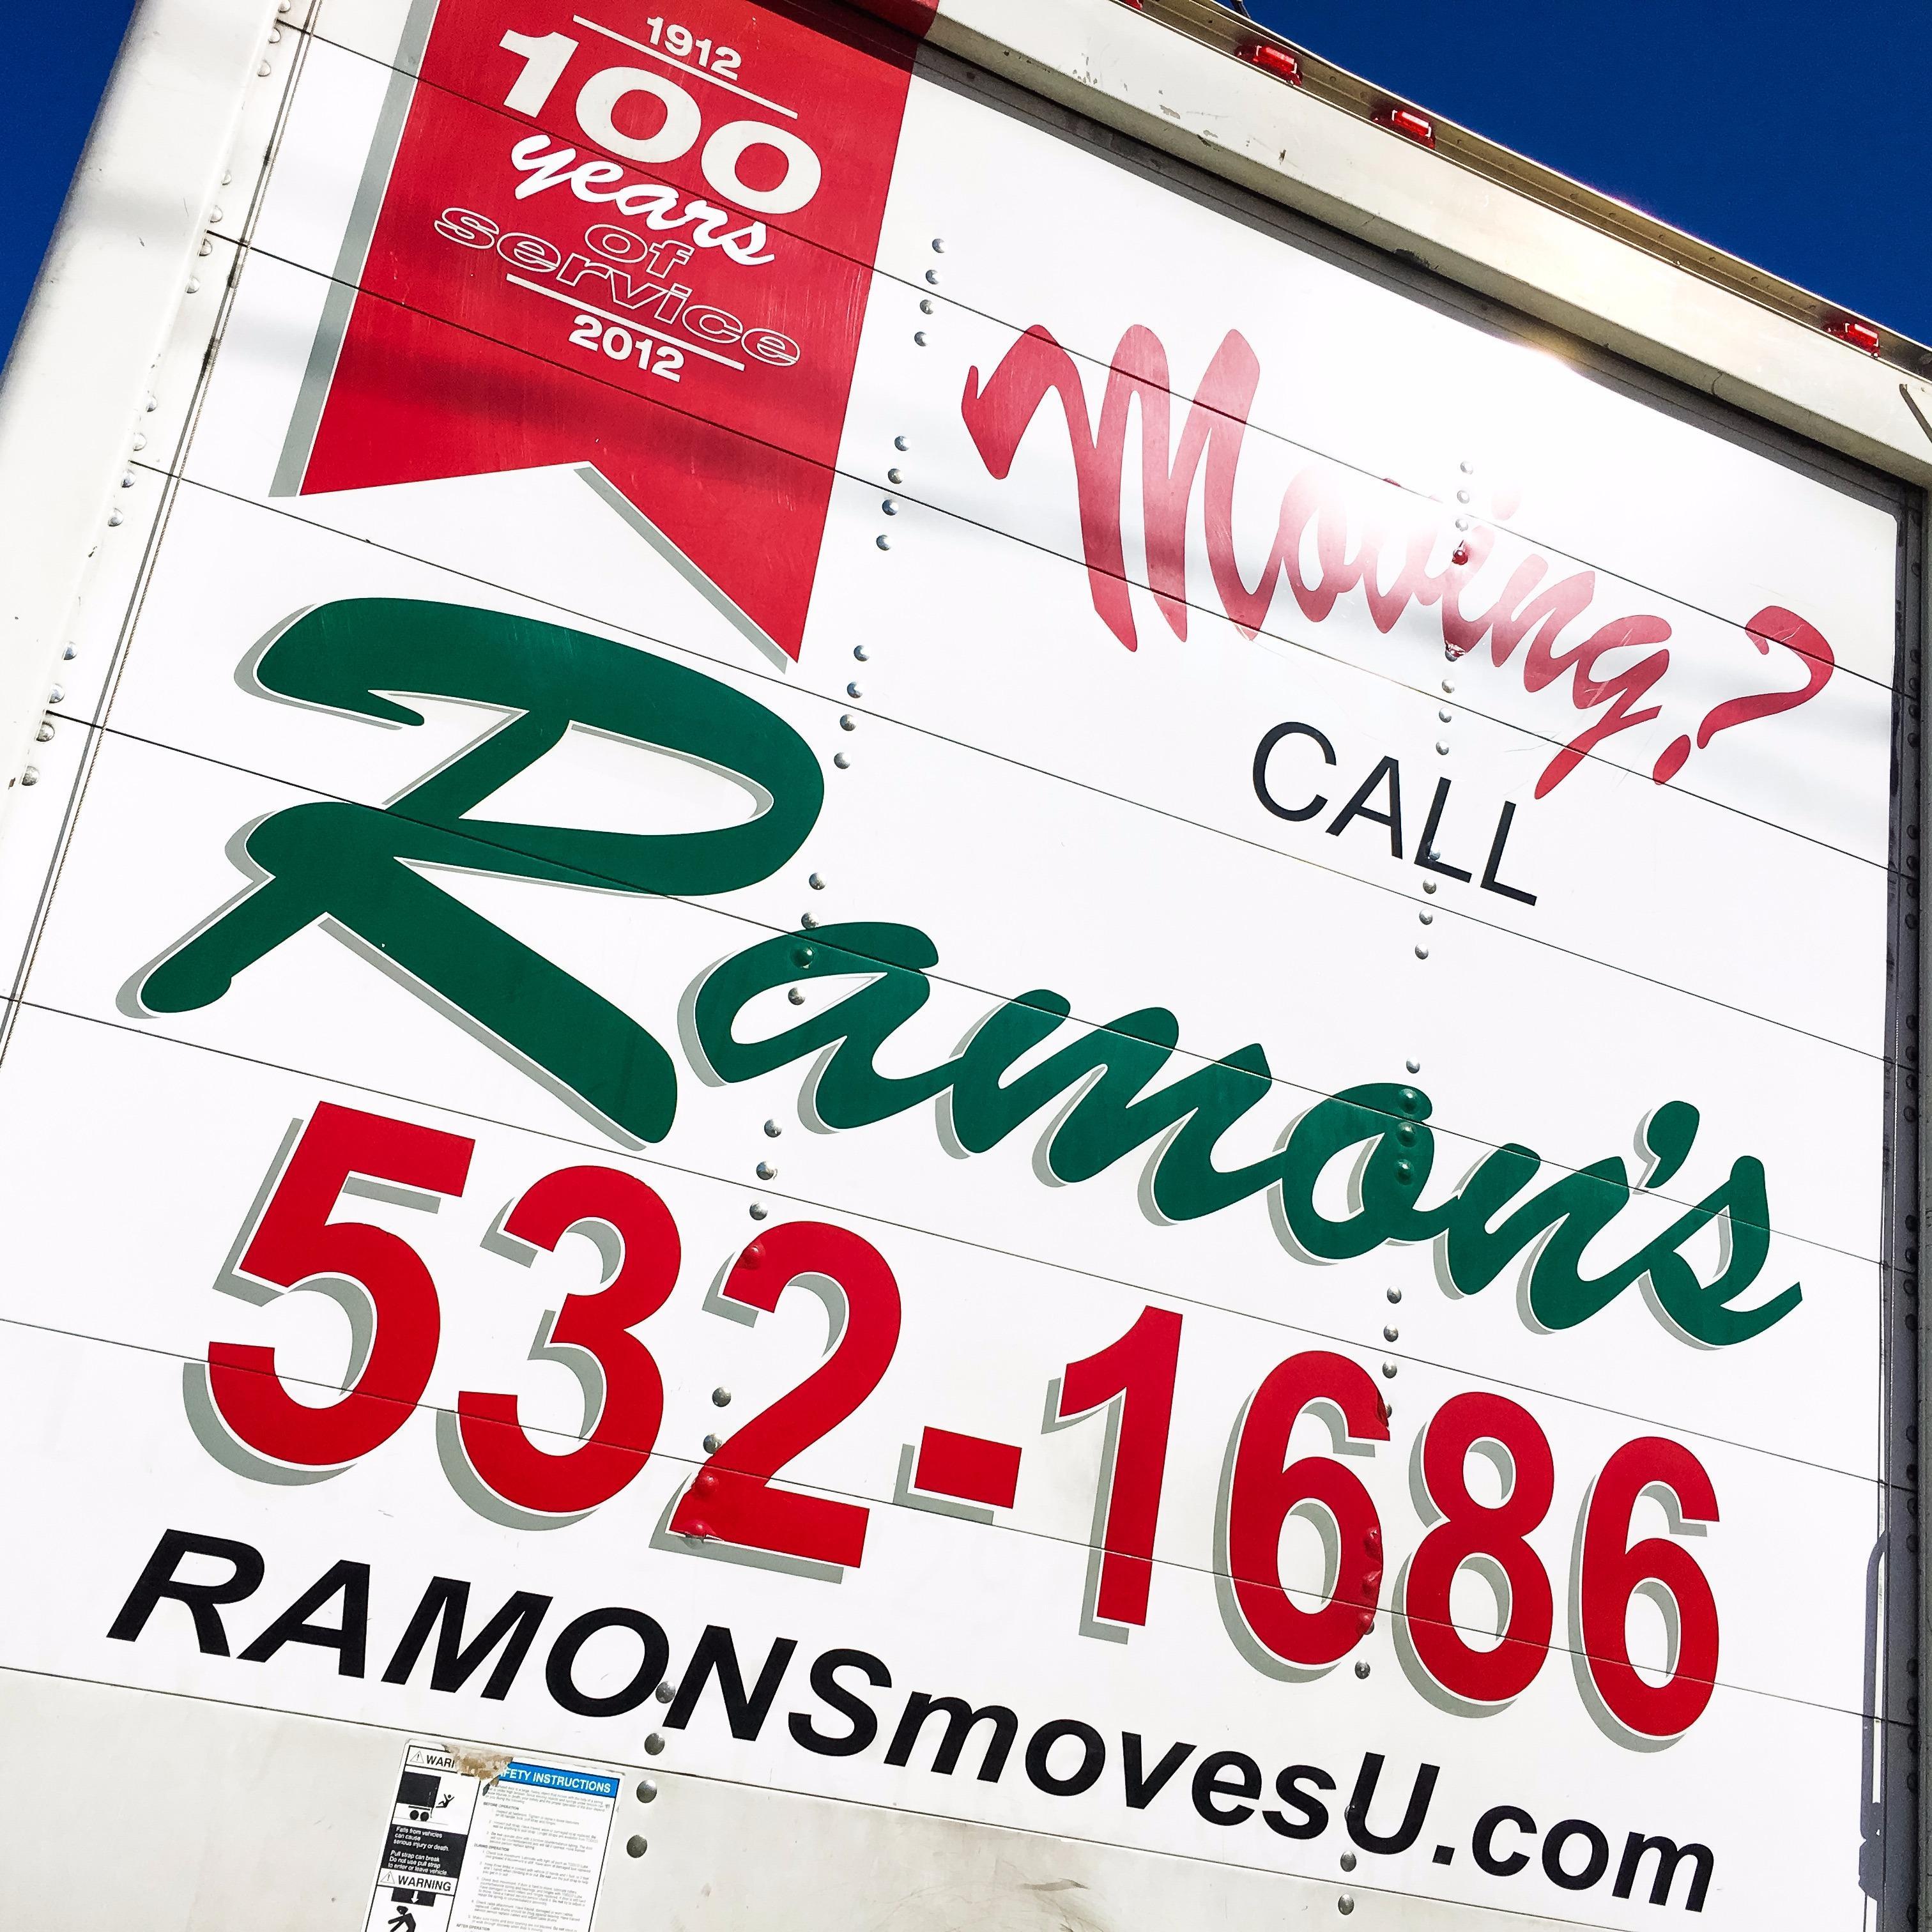 Ramon's Transfer Co